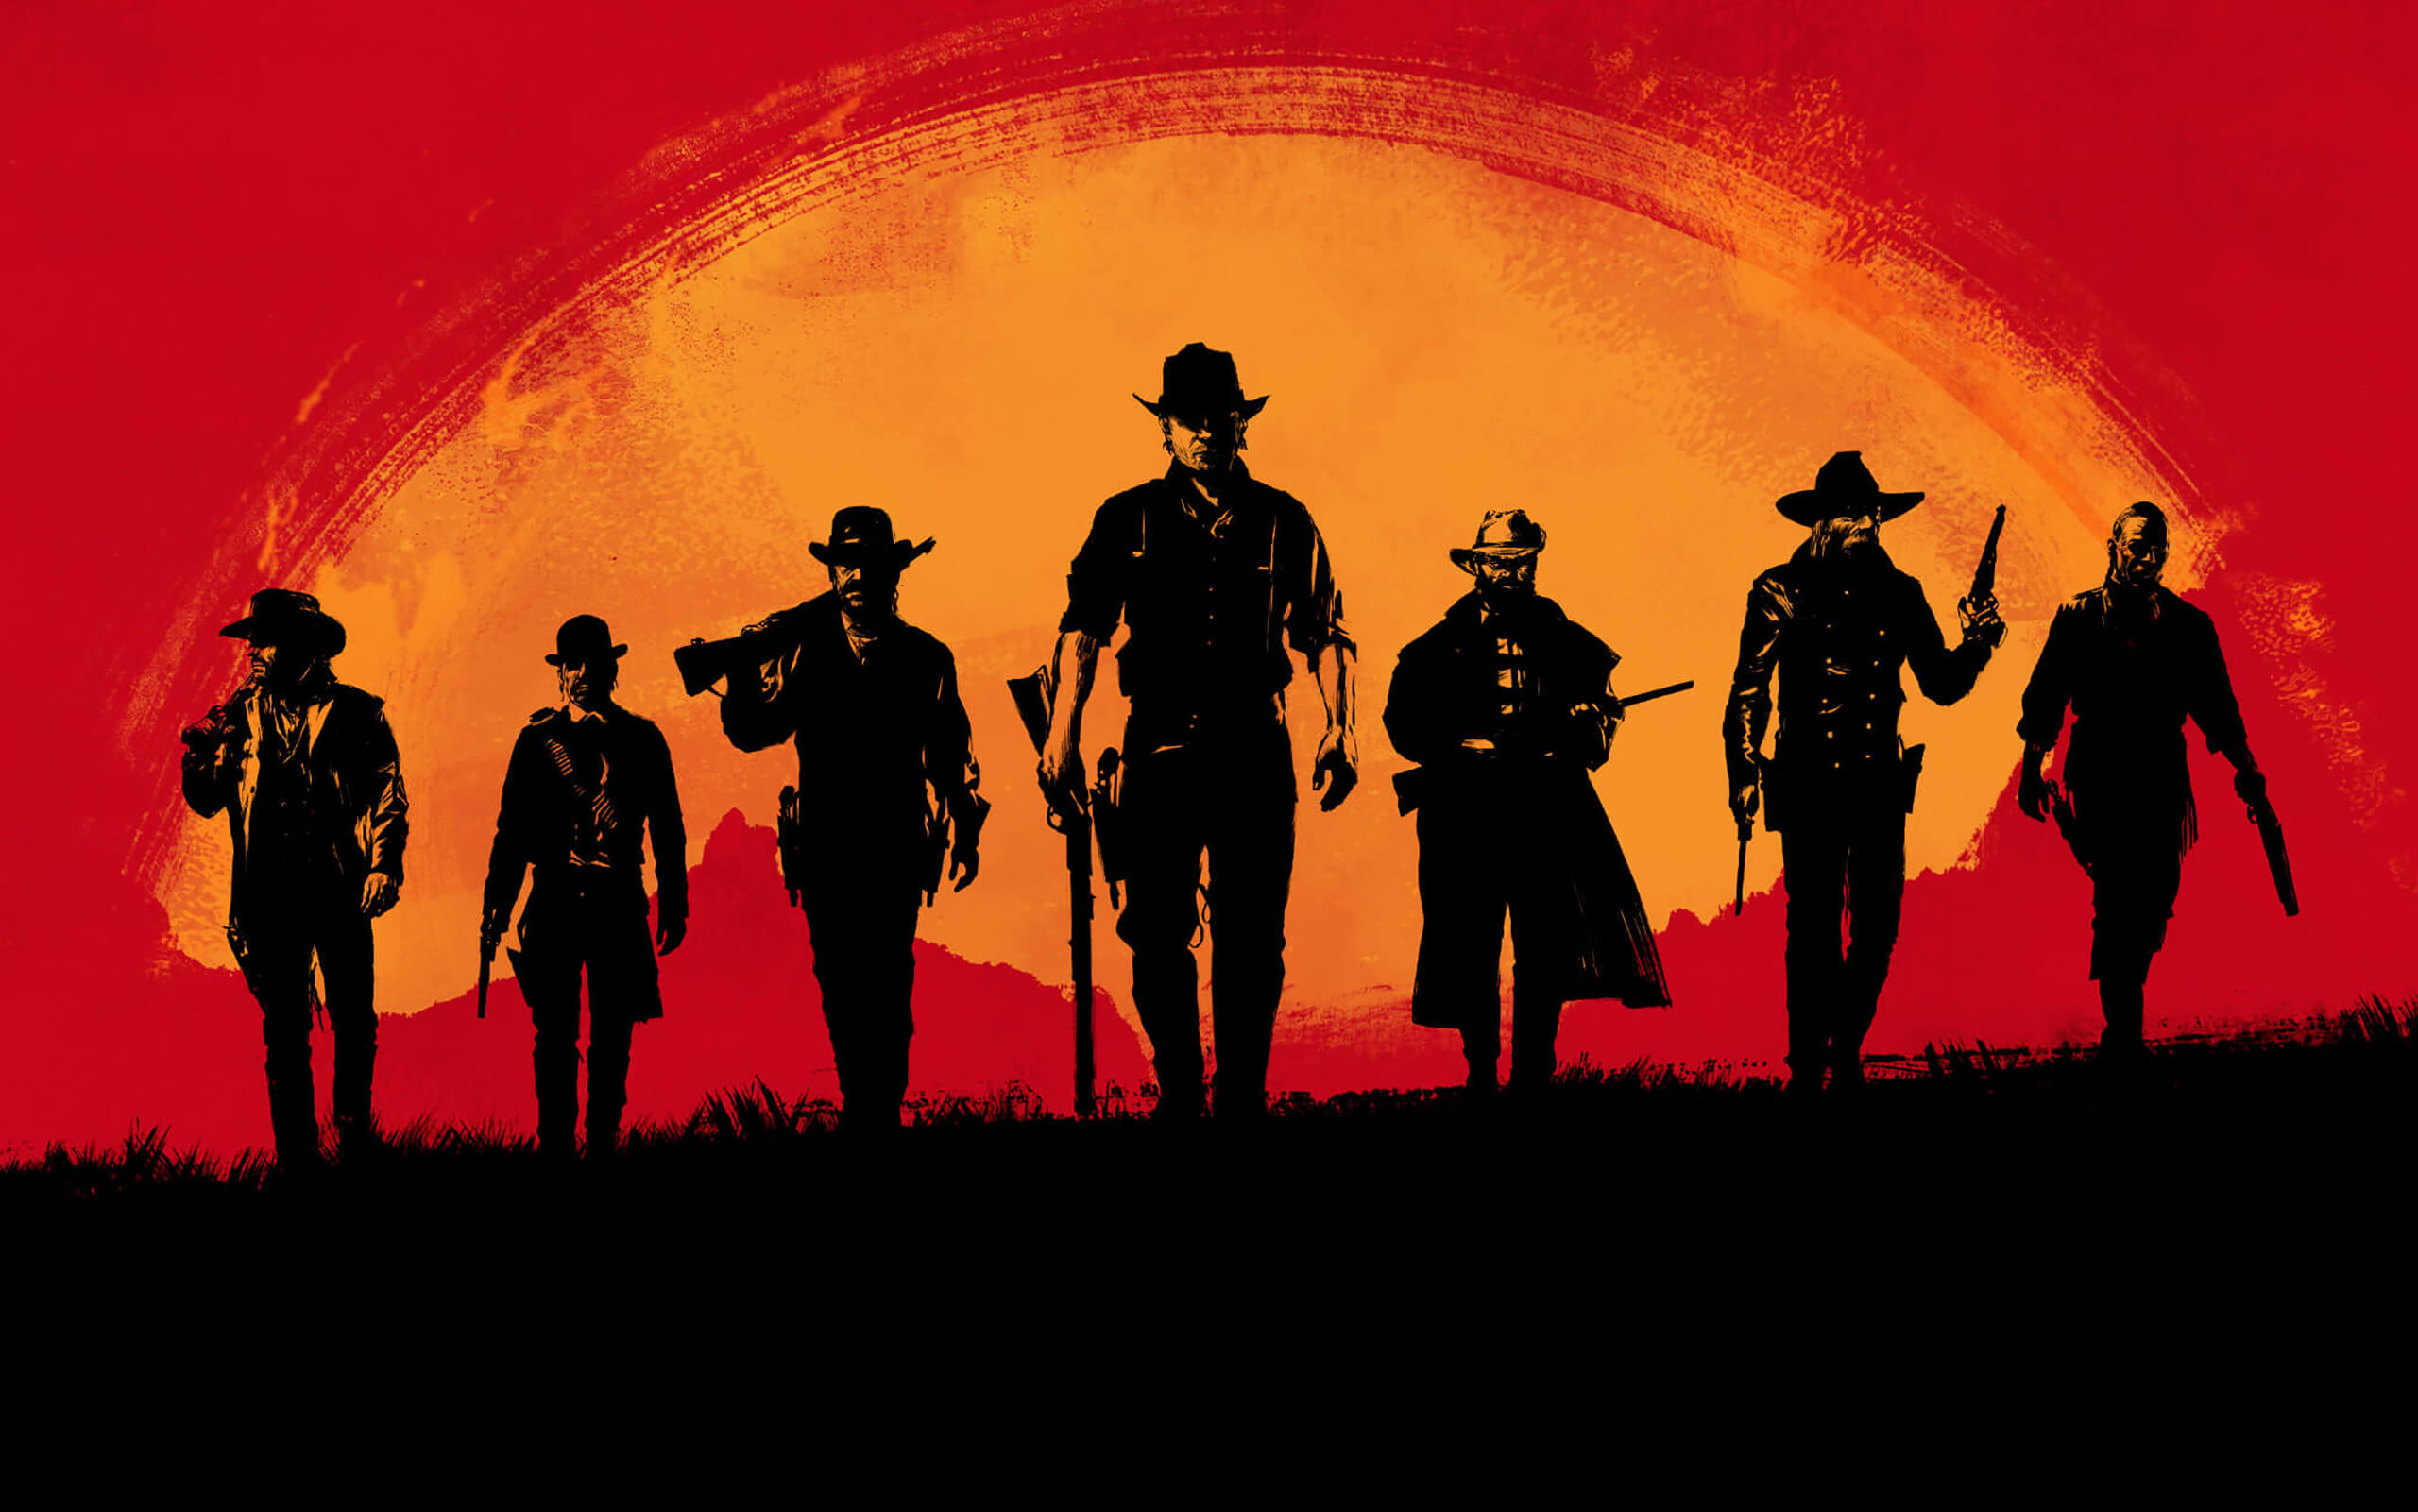 Red Dead Redemption 2 graphic